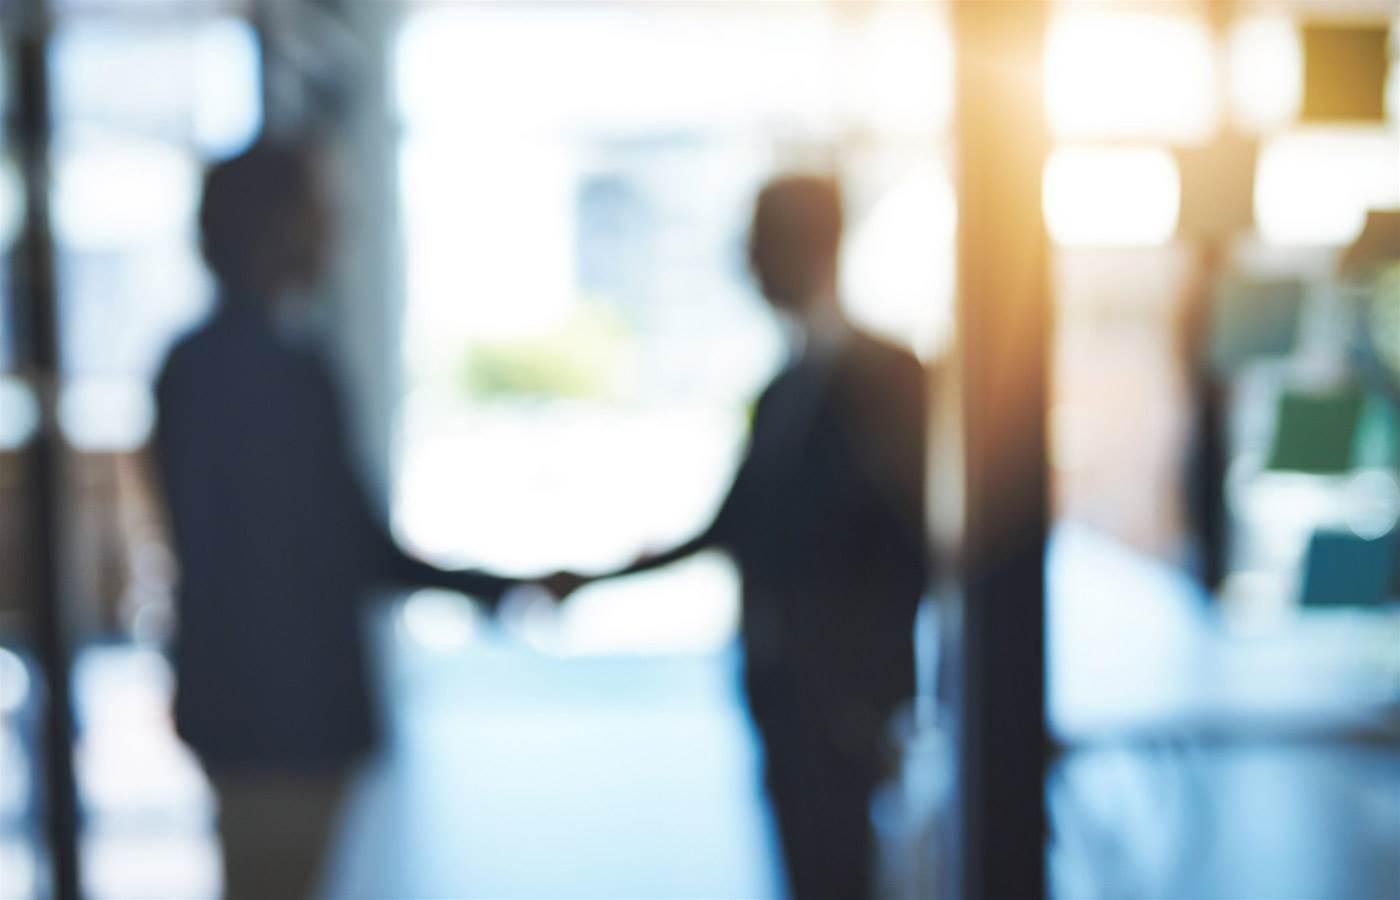 Cloudera and Hortonworks reveal US$5.2bn merger